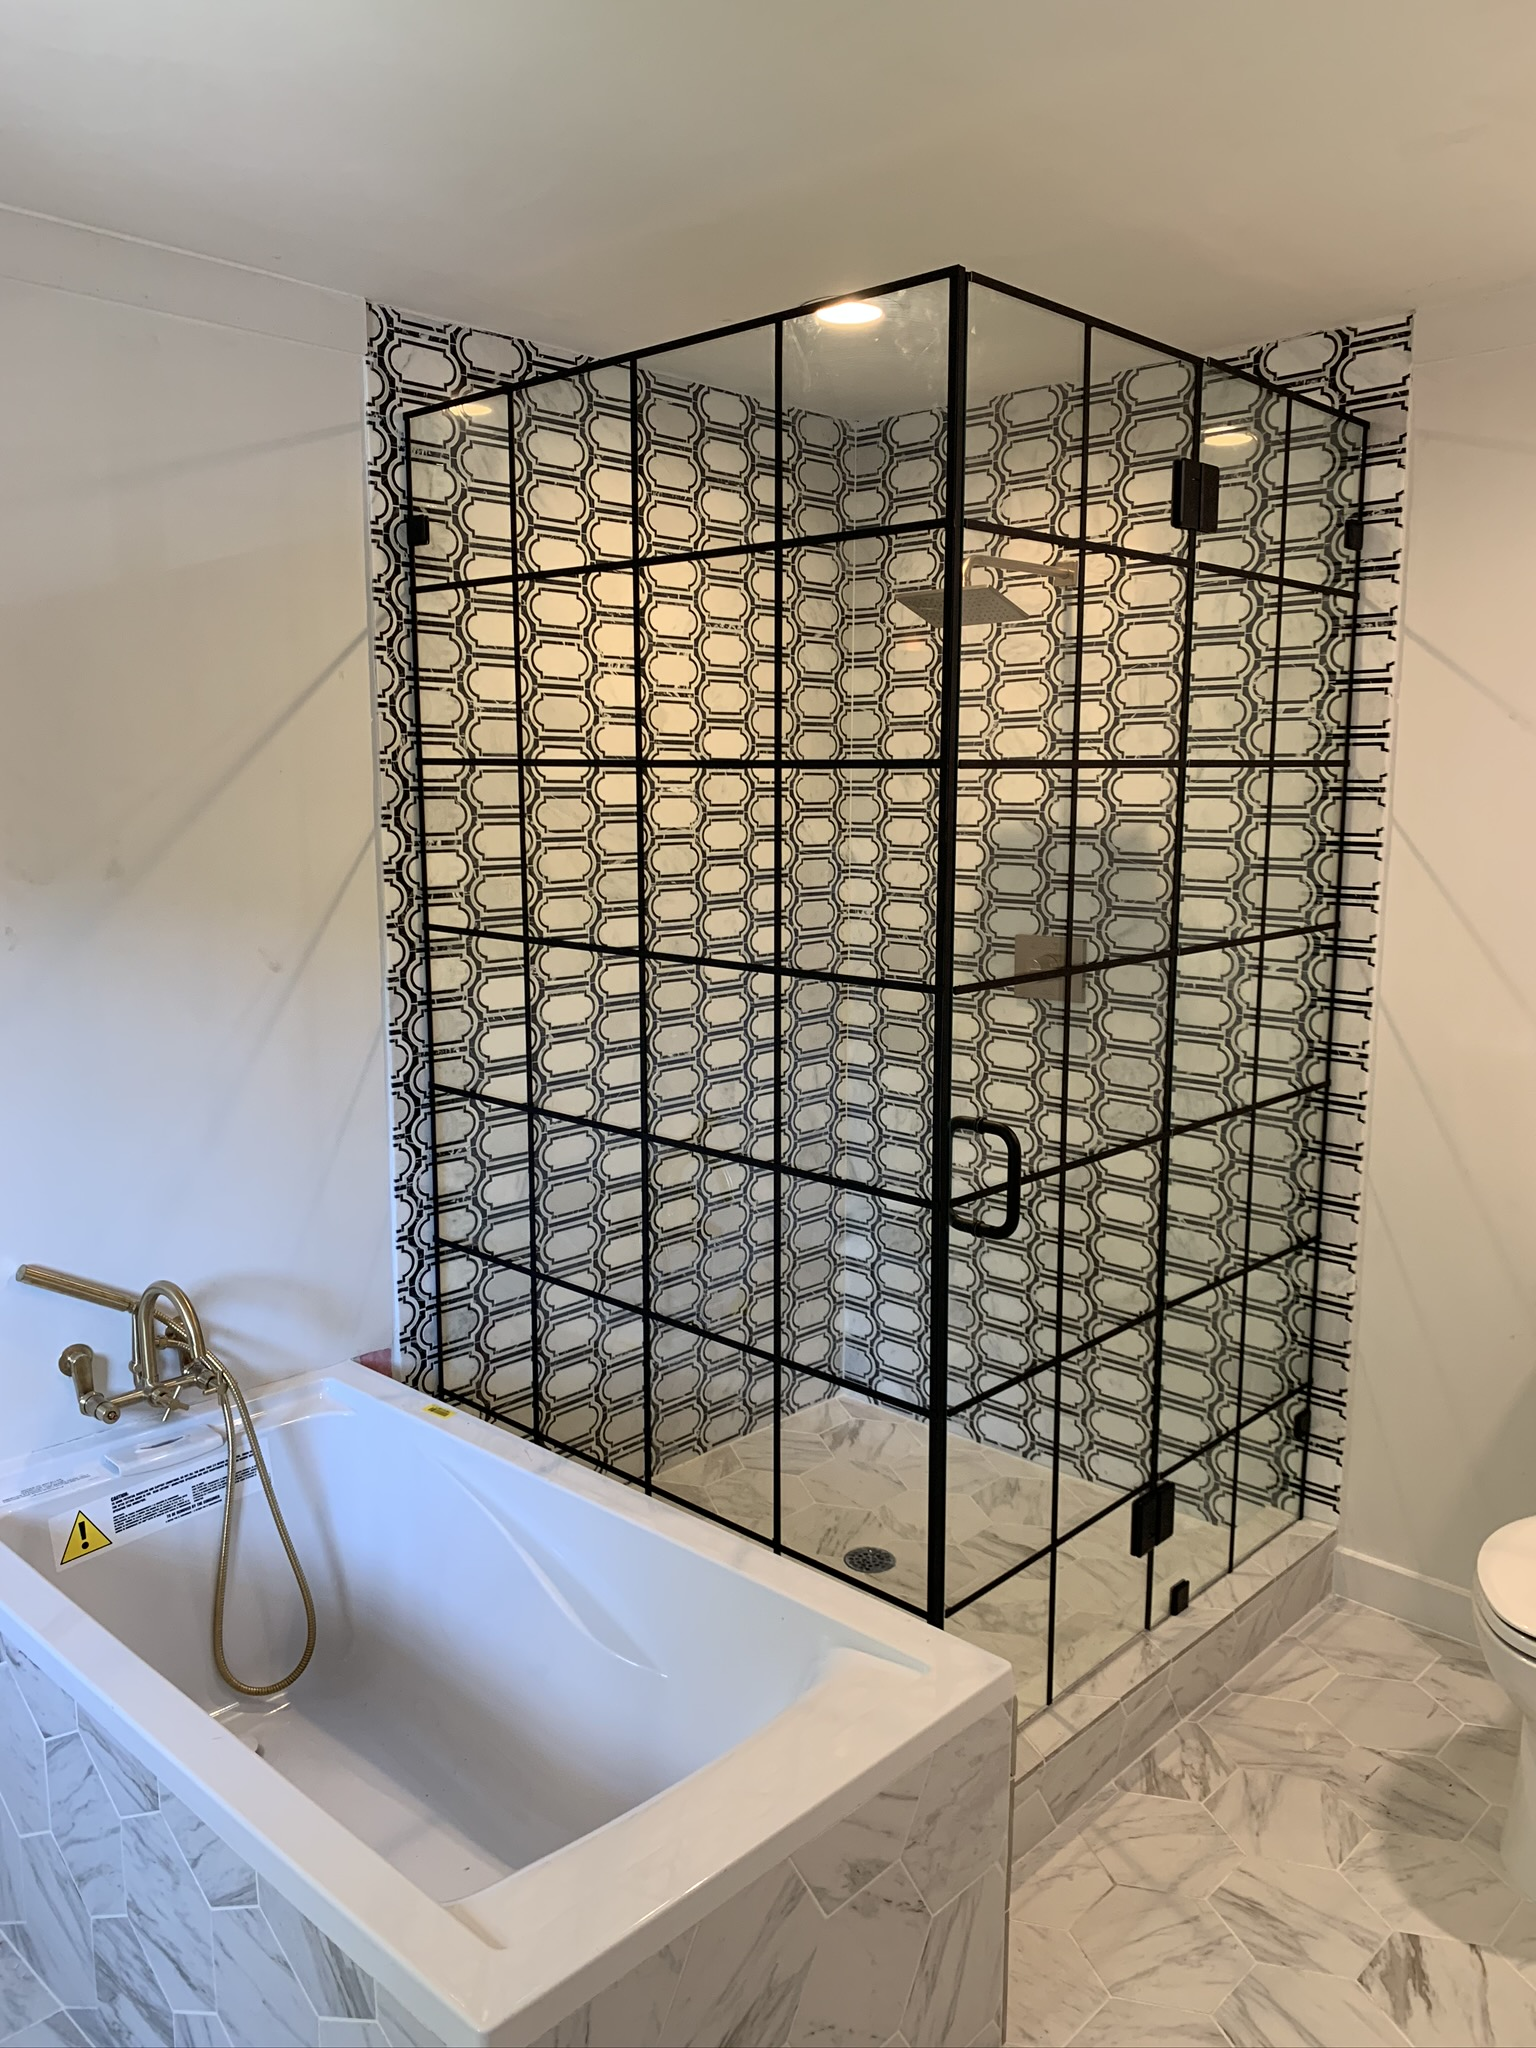 Grid Shower Enclosure